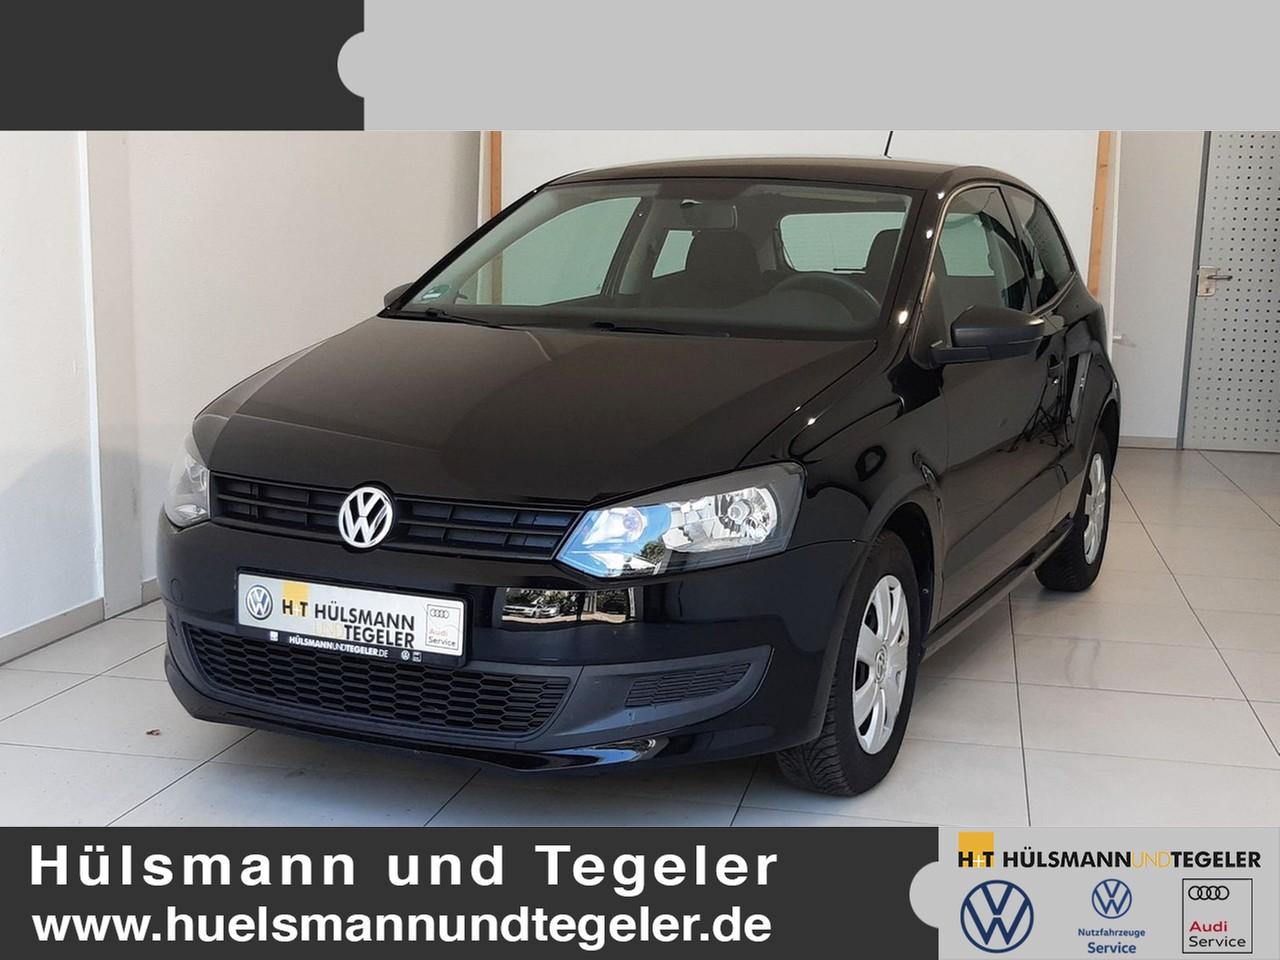 Volkswagen Polo 1.2 Trendline, Jahr 2013, Benzin